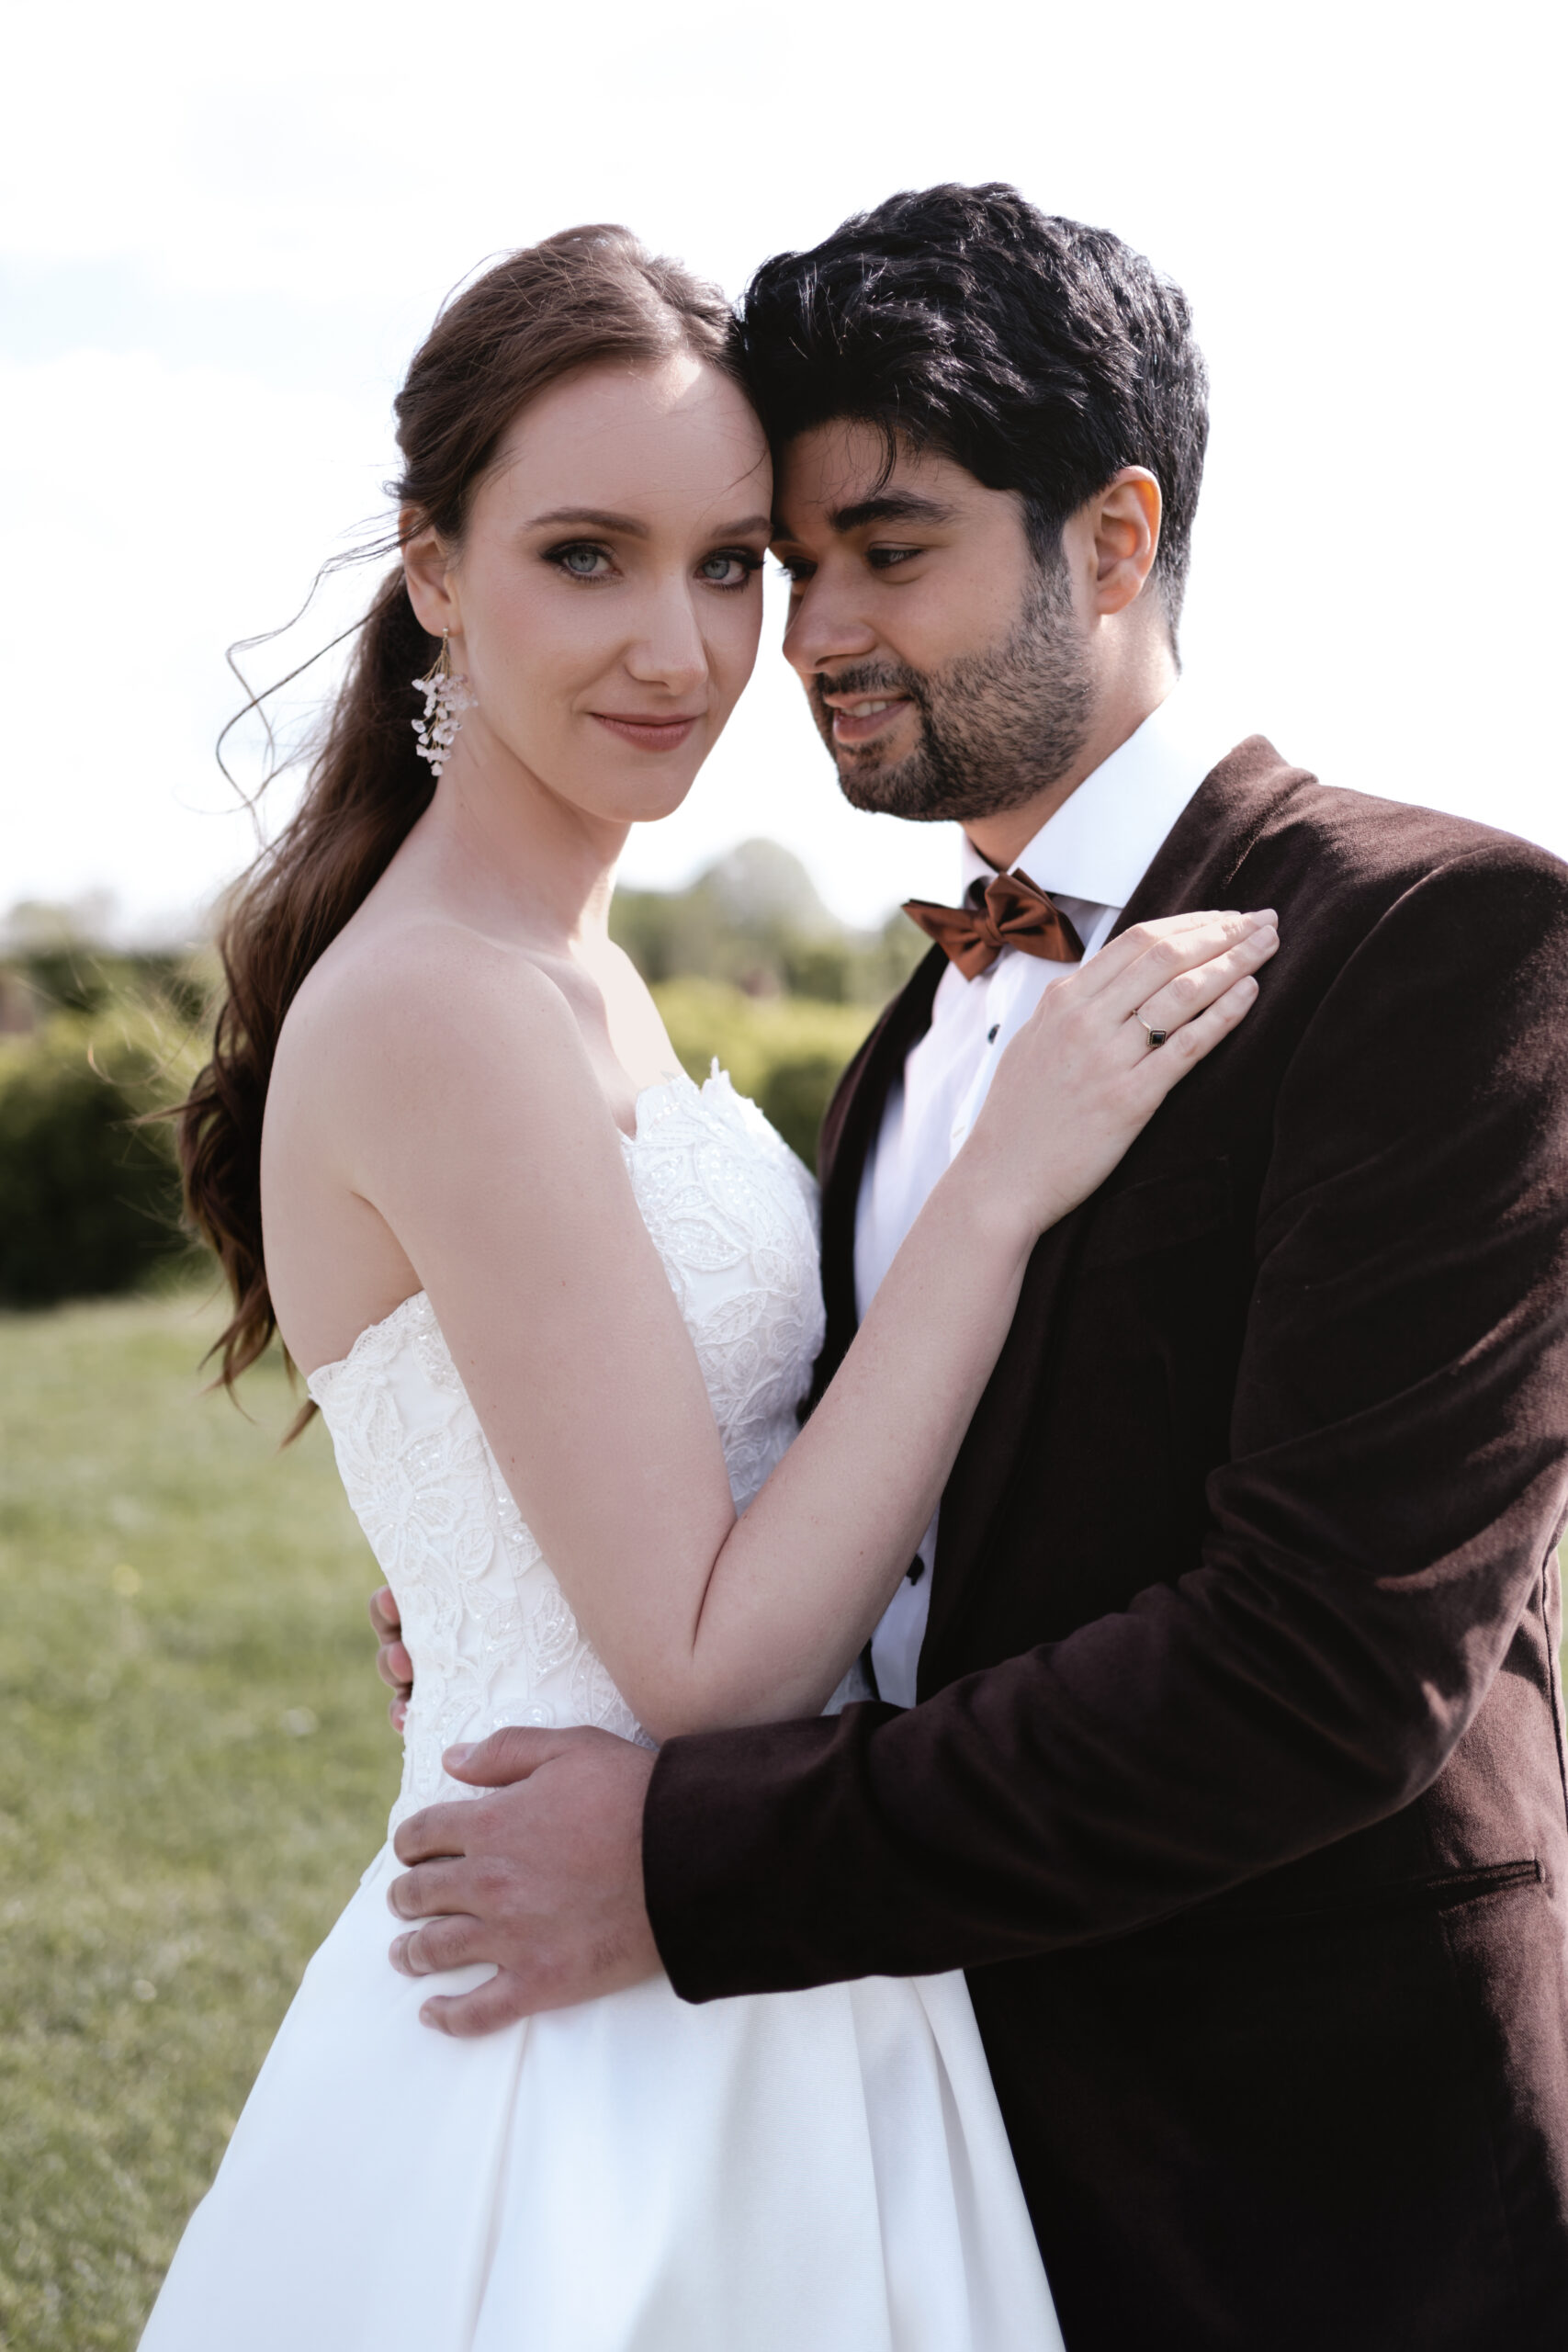 Marieke Creative Studio Ceremonie fotoHeader Fotografie Bruiloften Wedding Trouwfotograaf Bruiloft Bruidsfotografie New Born Zakelijk Fotografie